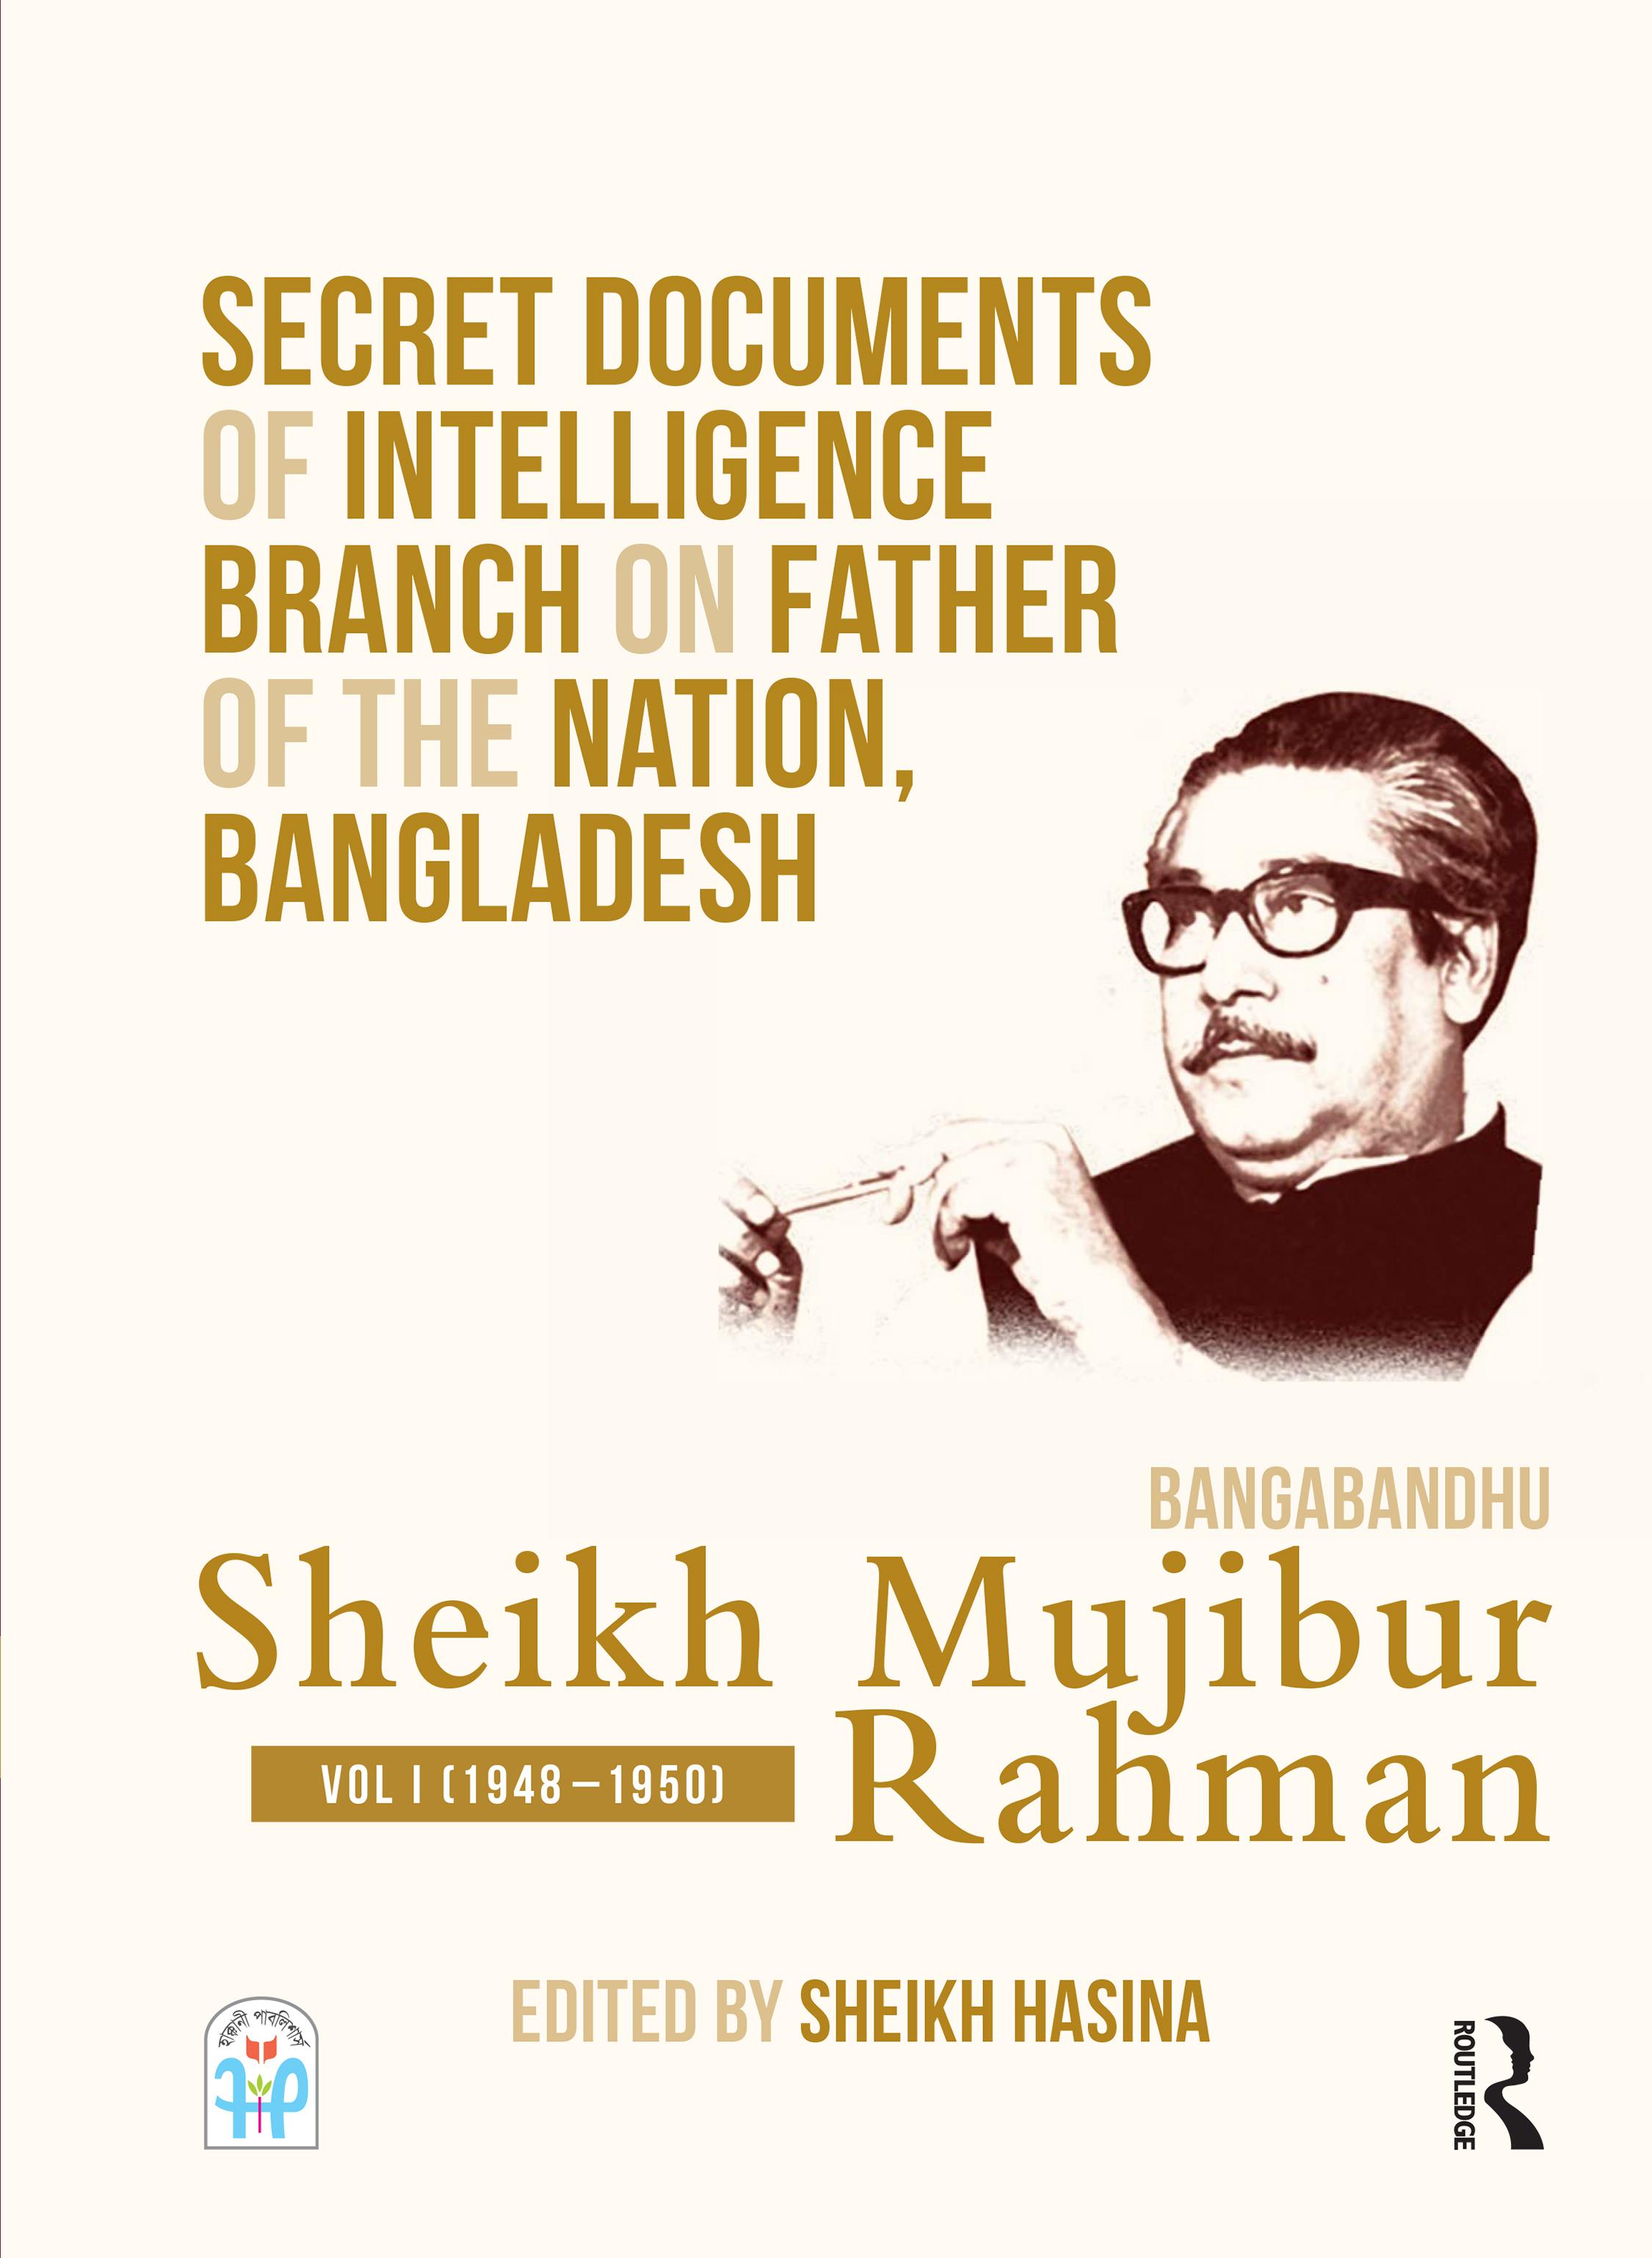 Secret Documents of Intelligence Branch on Father of the Nation, Bangladesh Bangabandhu Sheikh Mujibur Rahman 1948–1971 Declassified Documents Vol - I (1948 – 1950)